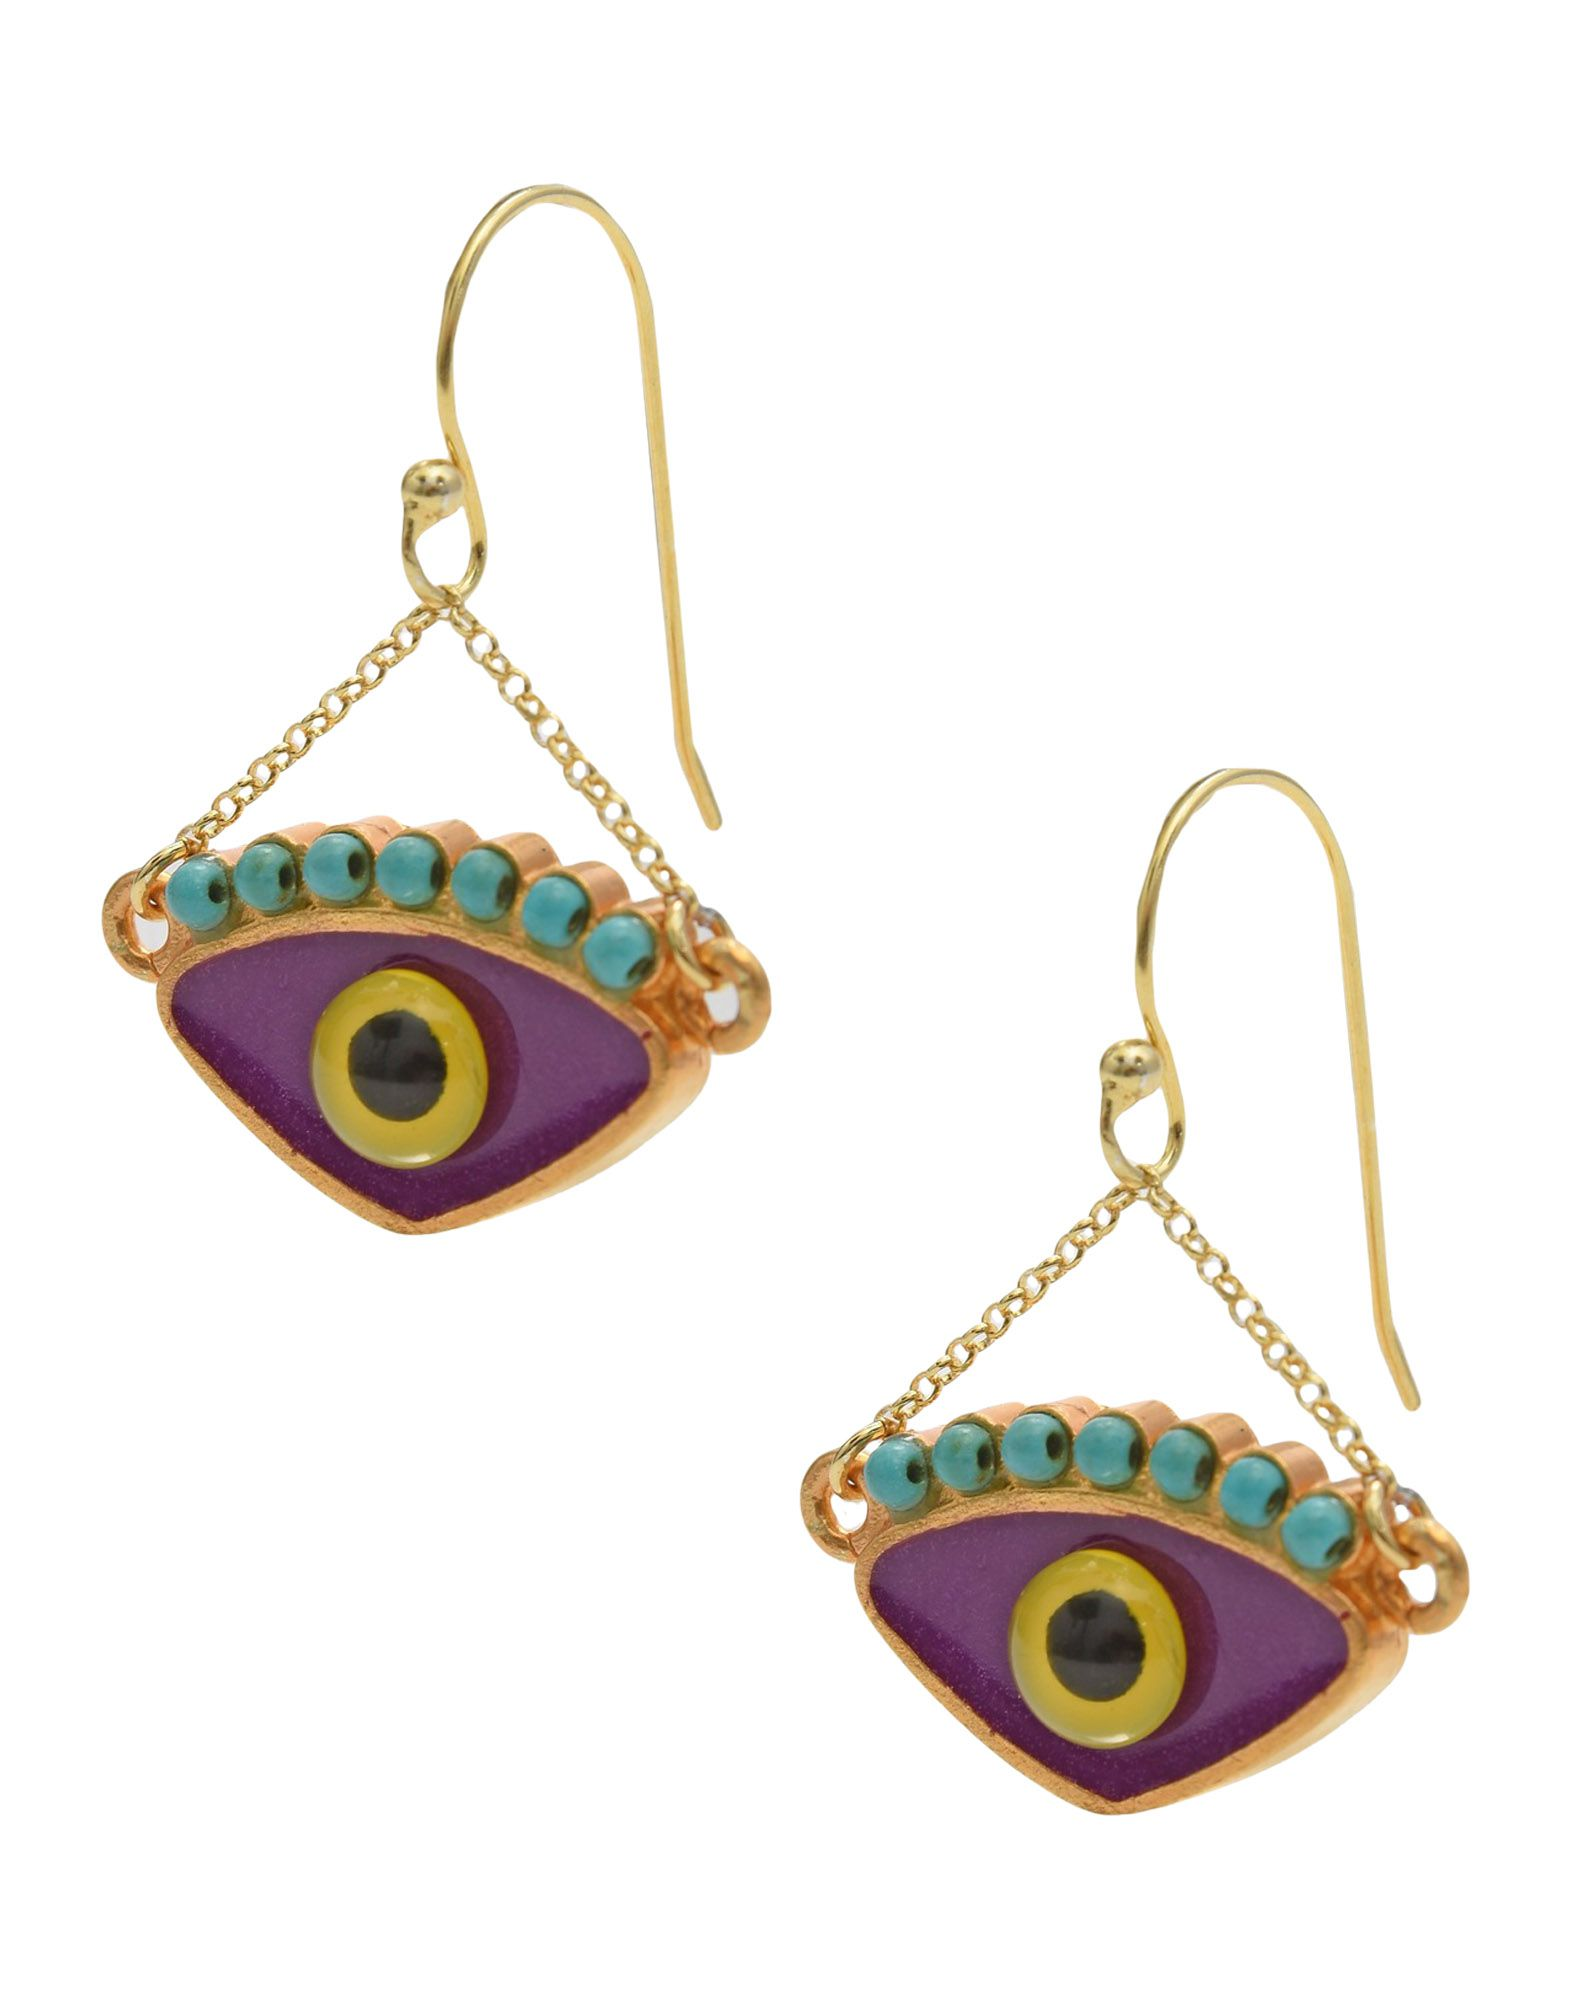 KATERINA PSOMA Earrings in Purple